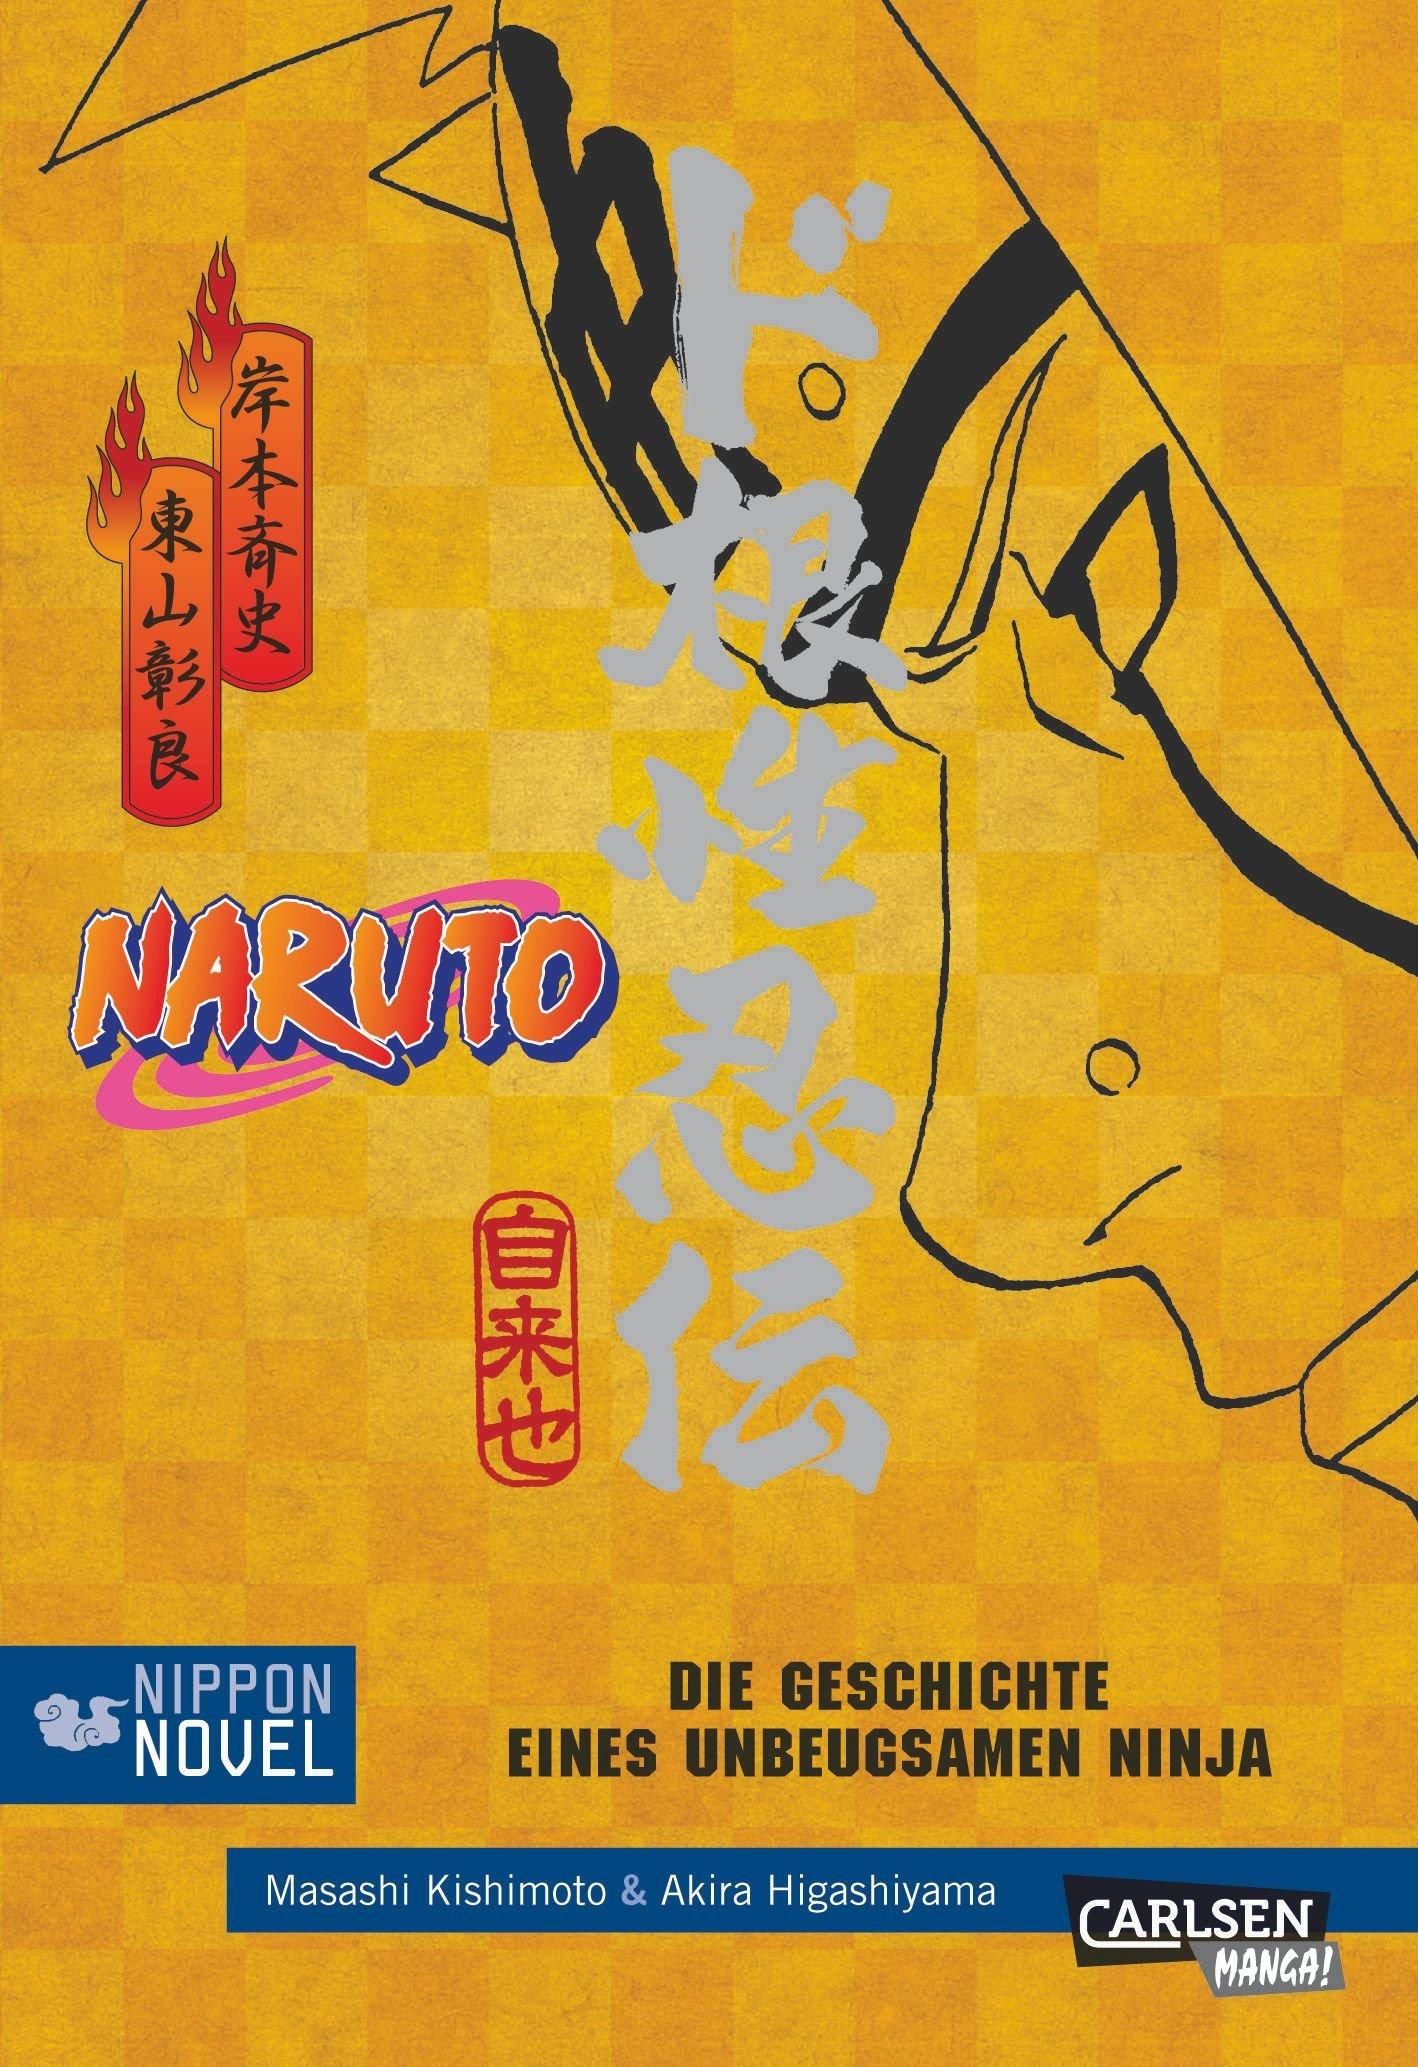 Die Geschichte eines unbeugsamen Ninja (Nippon Novel) (Naruto) Taschenbuch – 3. Juli 2012 Akira Higashiyama Masashi Kishimoto Carlsen 3551767041